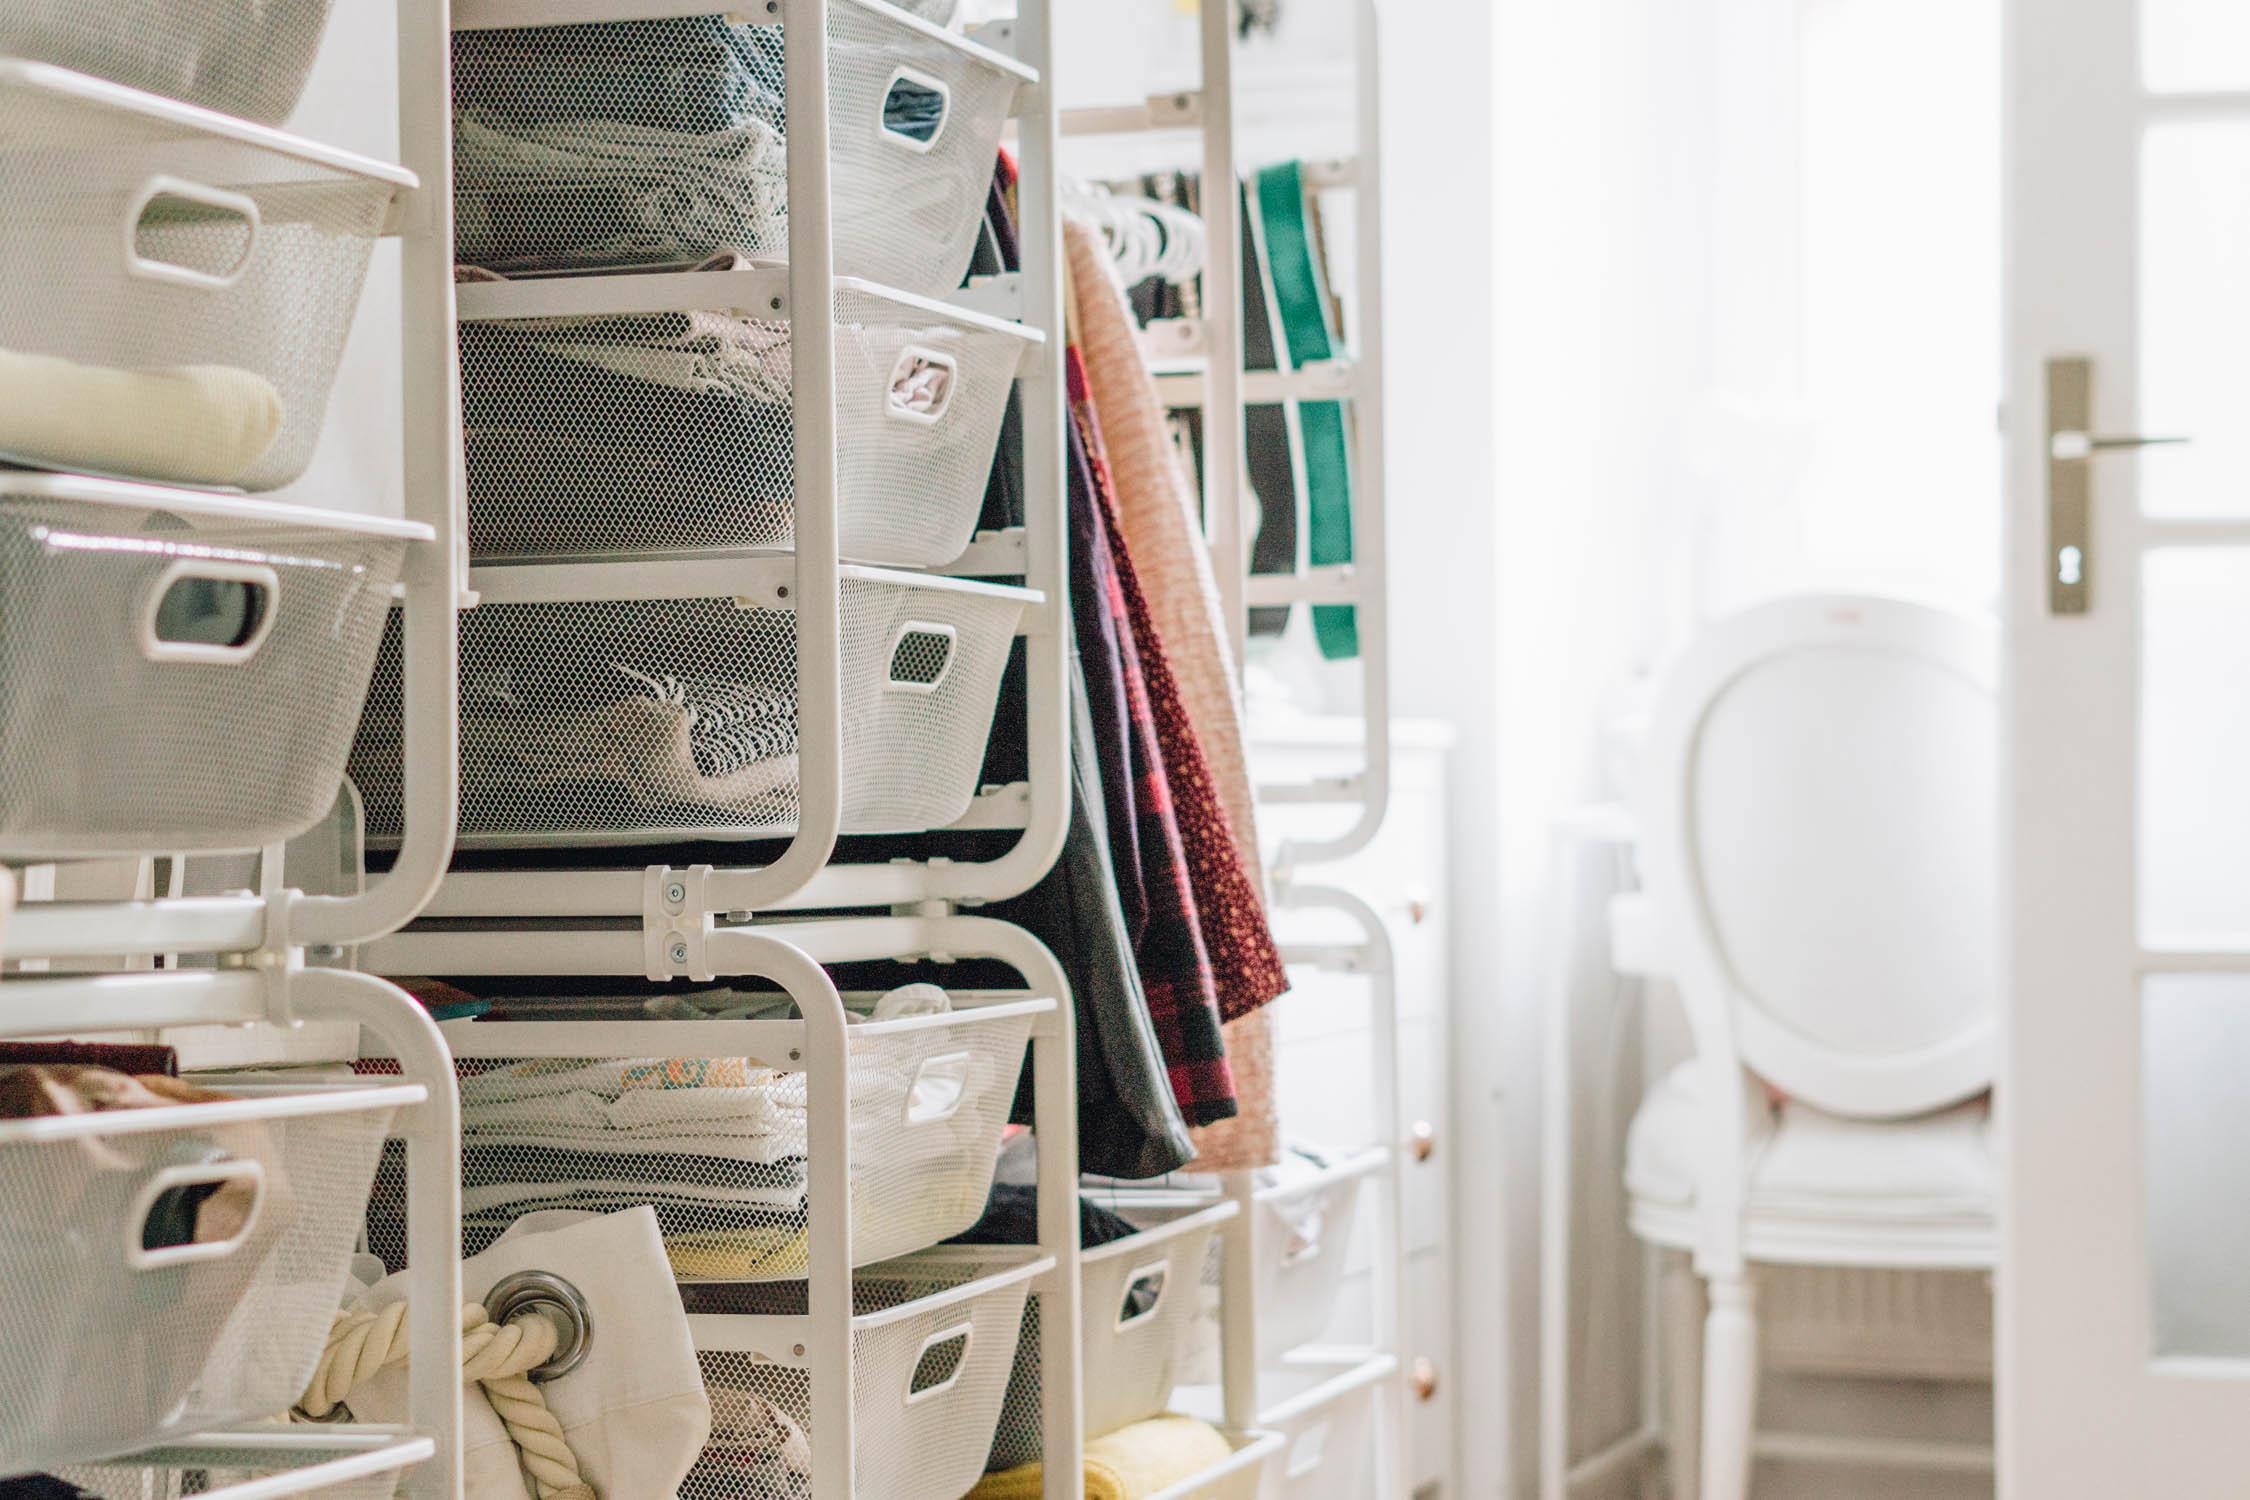 Wie baue ich den perfekten offenen kleiderschrank - Wie baue ich einen begehbaren kleiderschrank ...